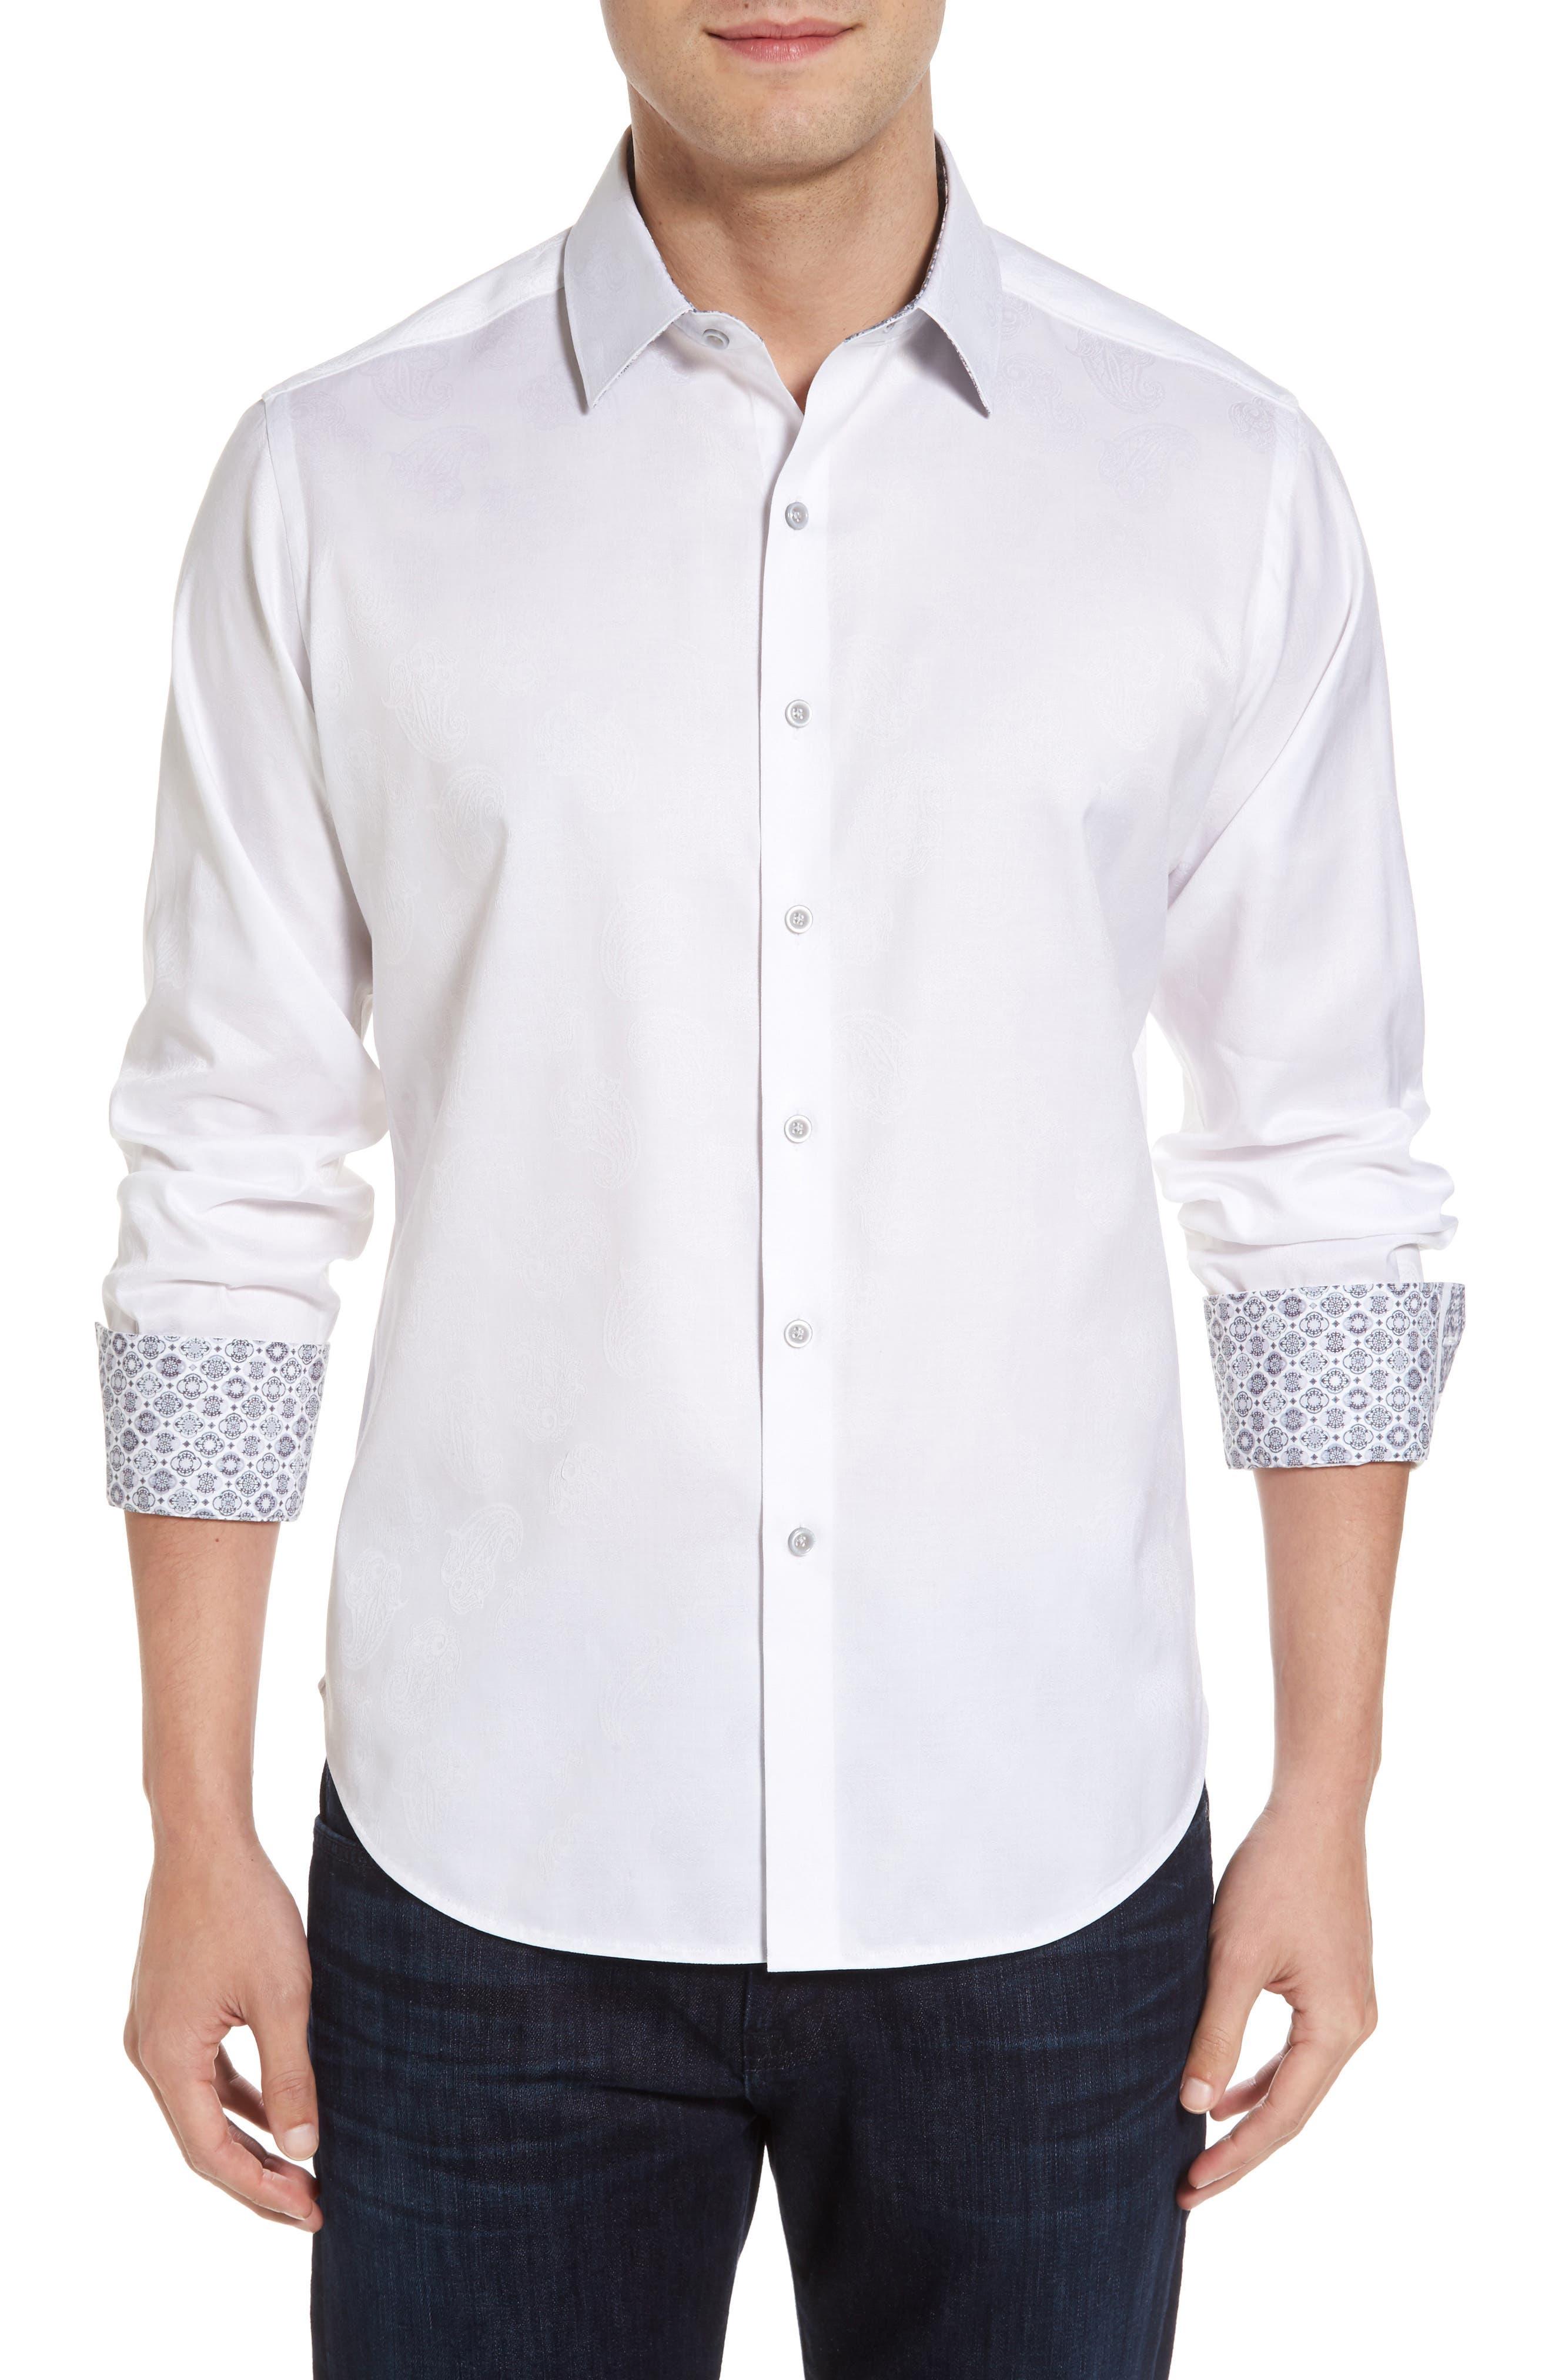 Haystack Regular Fit Jacquard Sport Shirt,                         Main,                         color, White